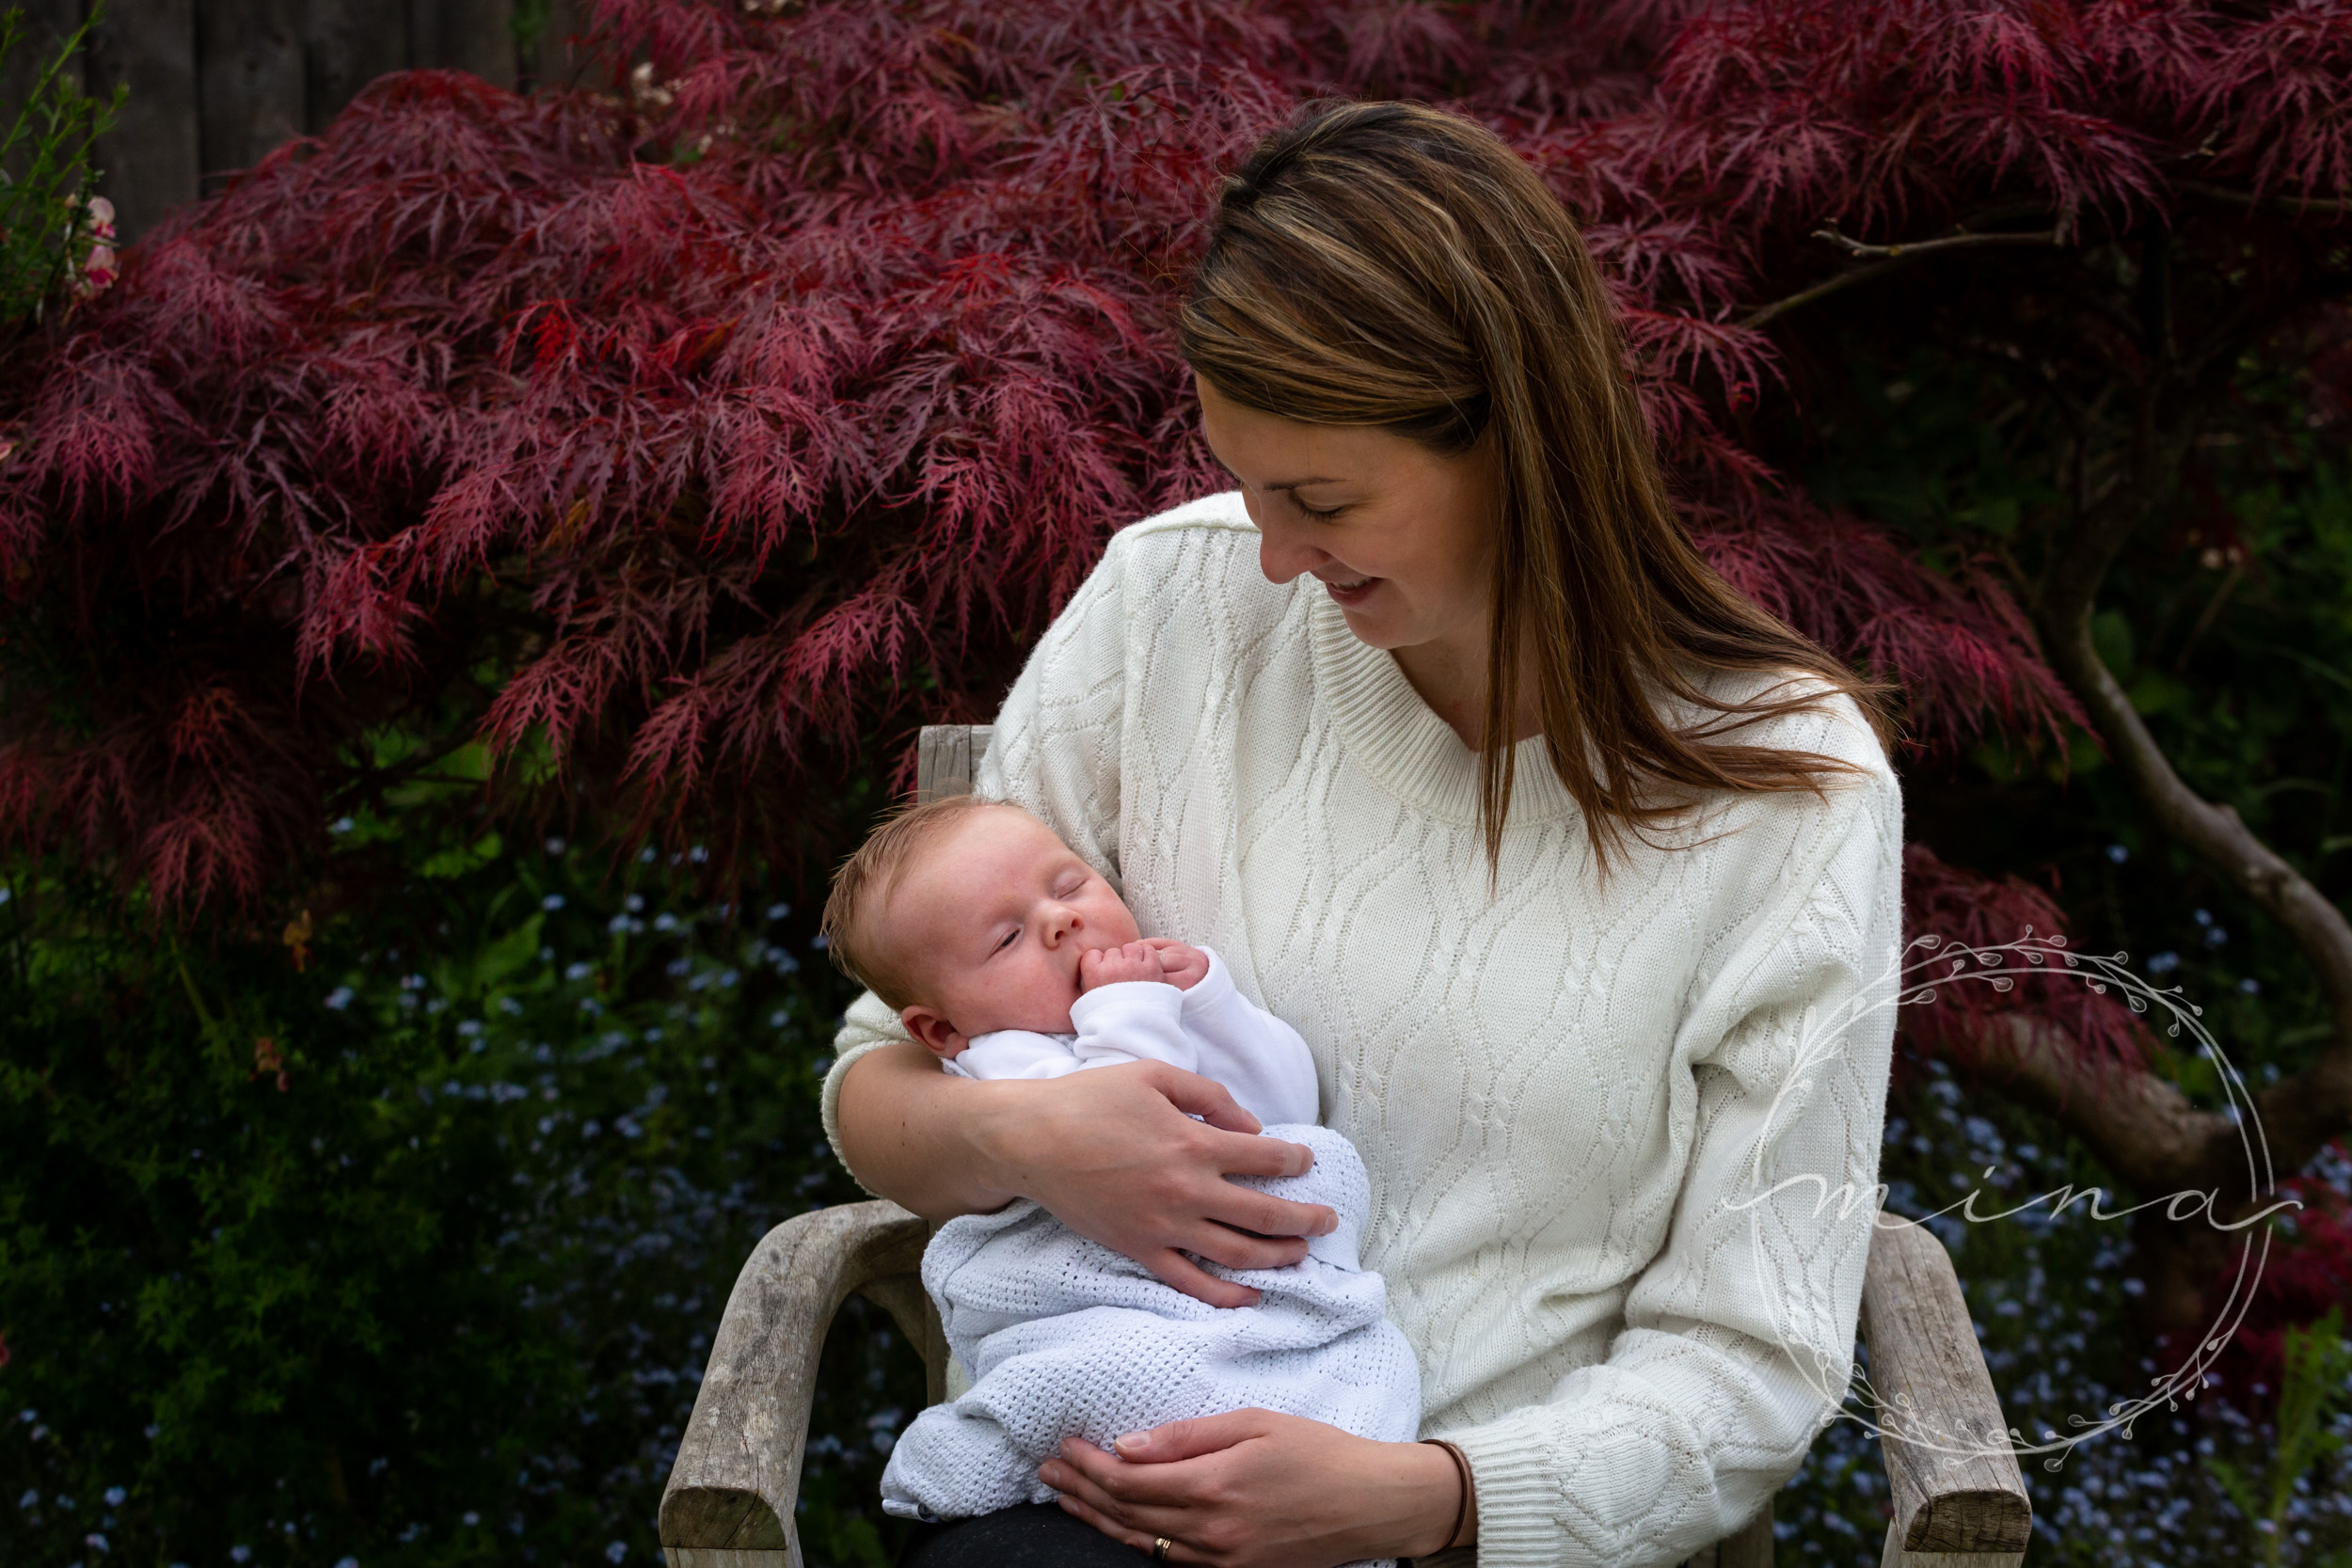 Richmond-upon-Thames Newborn Photographer